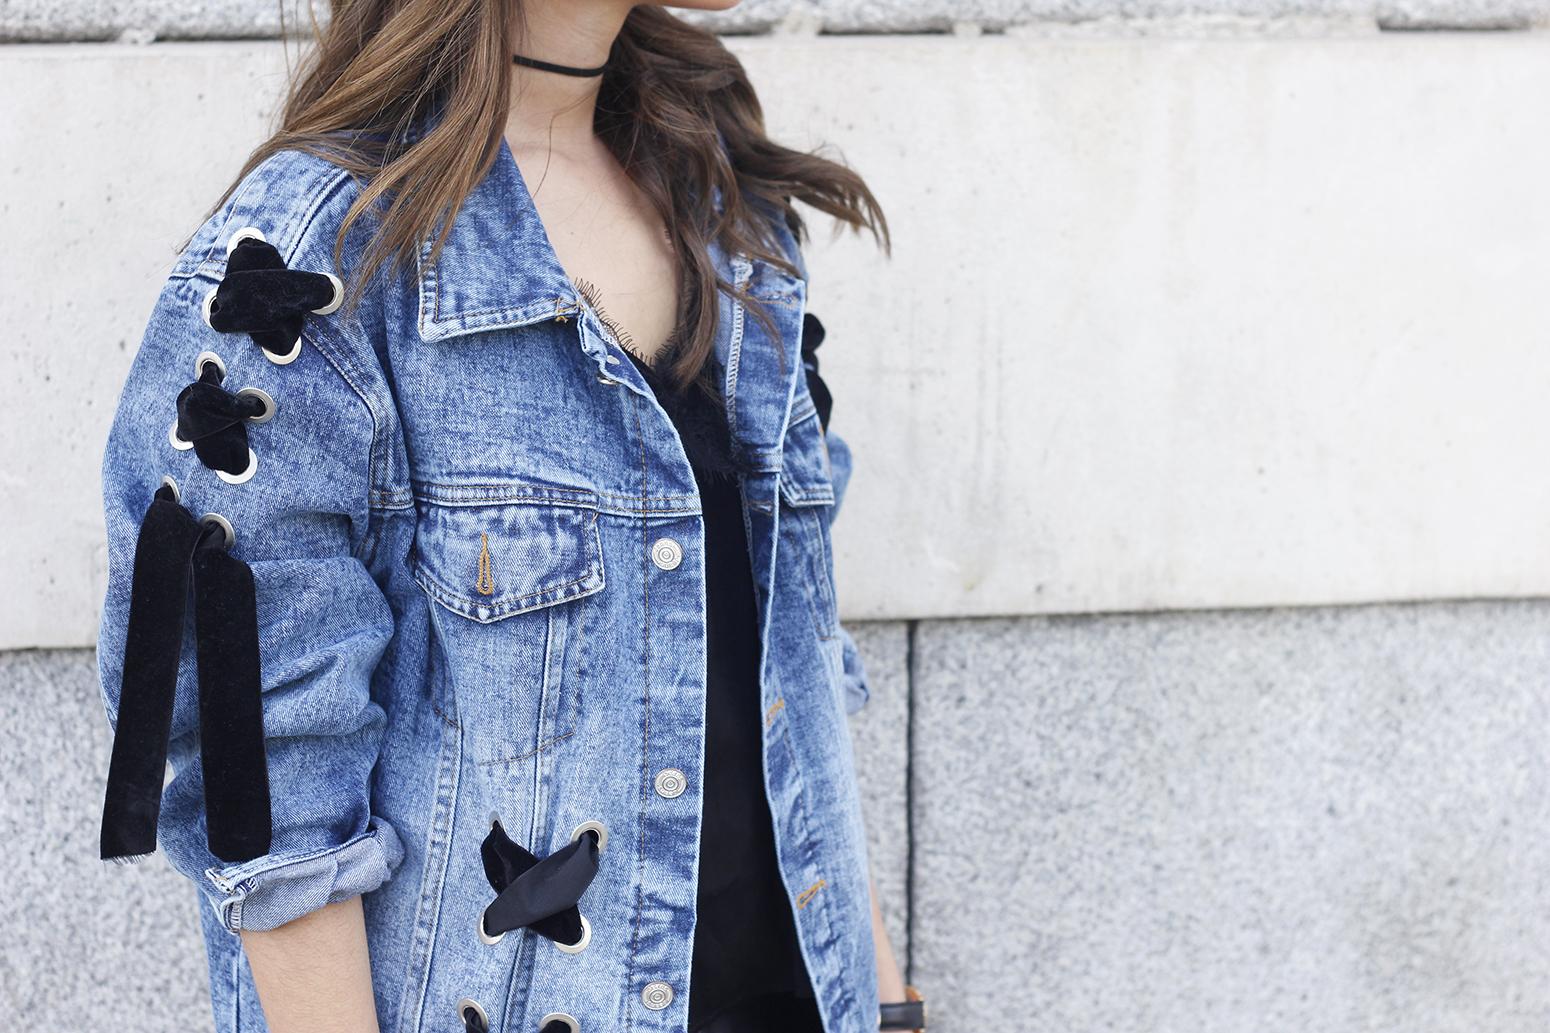 denim jacket leather skirt black heels outfit style fashion summer20